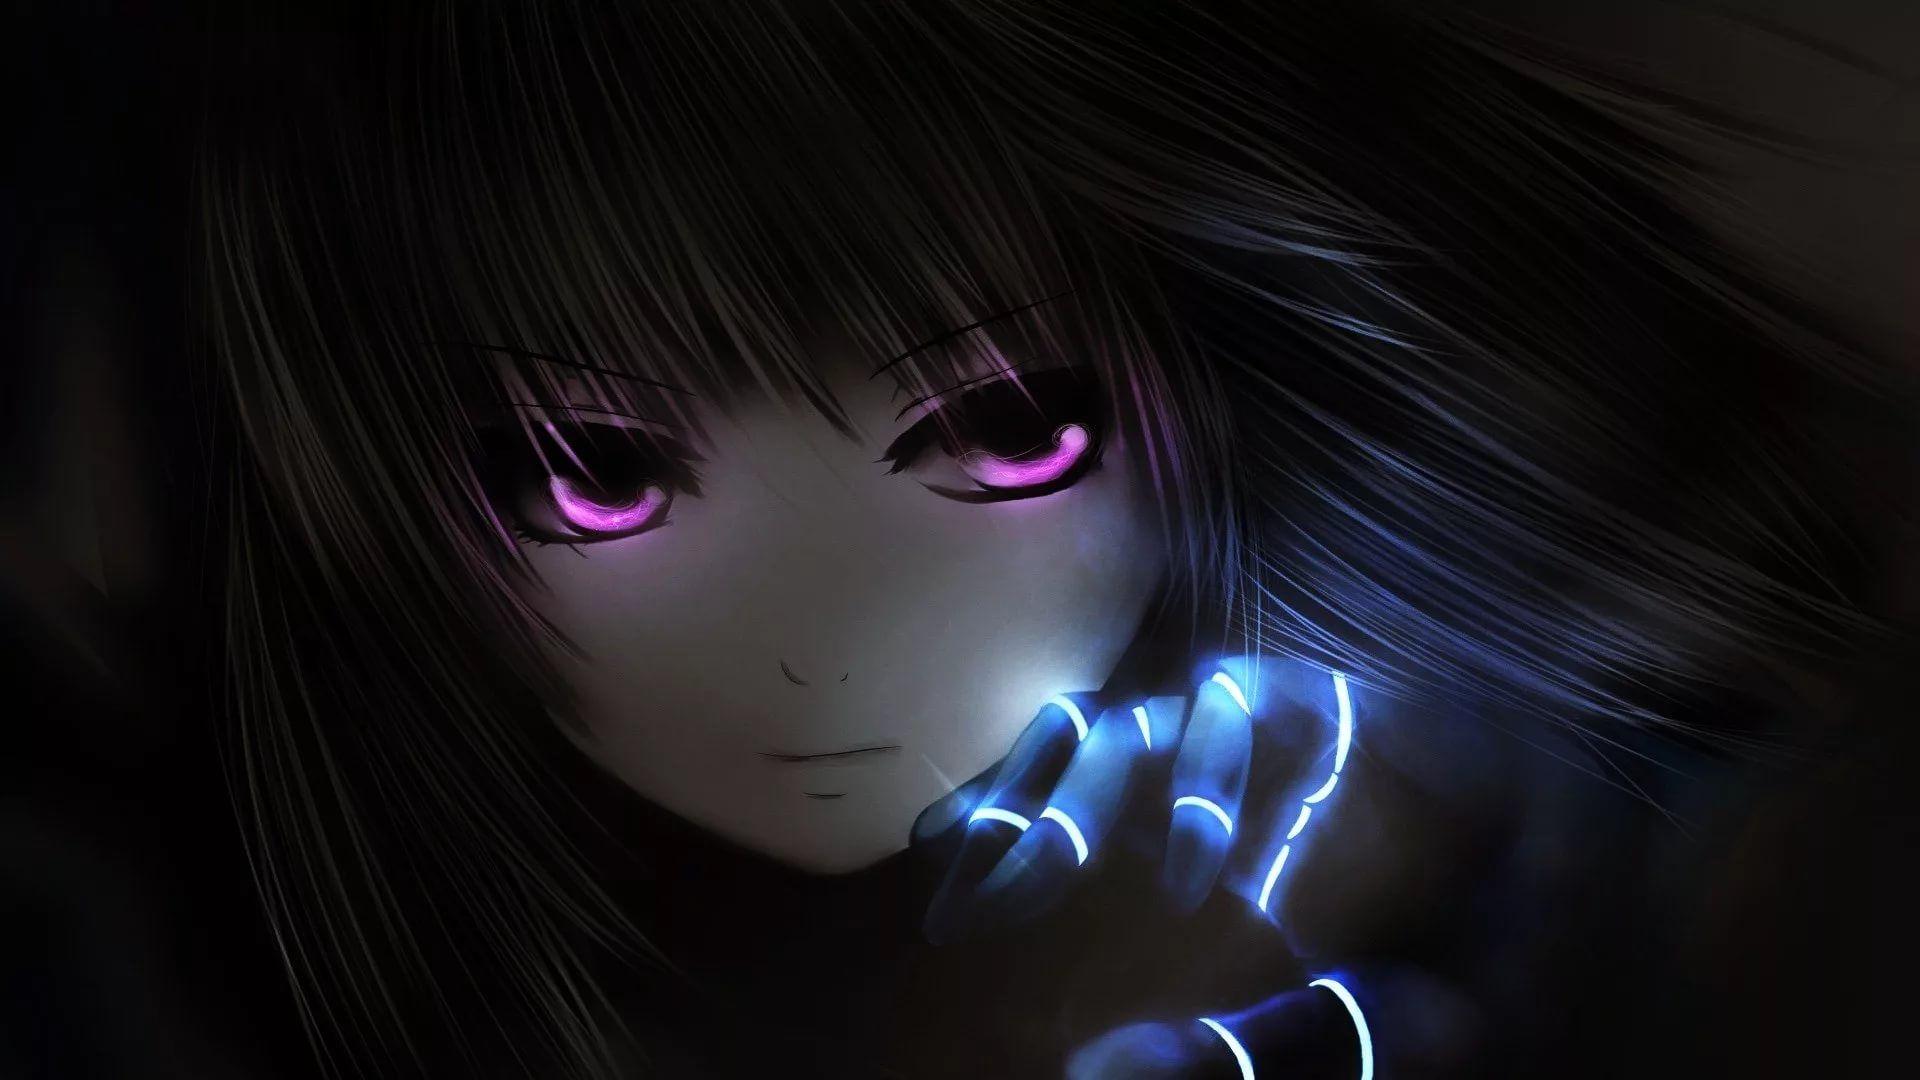 Dark Anime HD Wallpaper